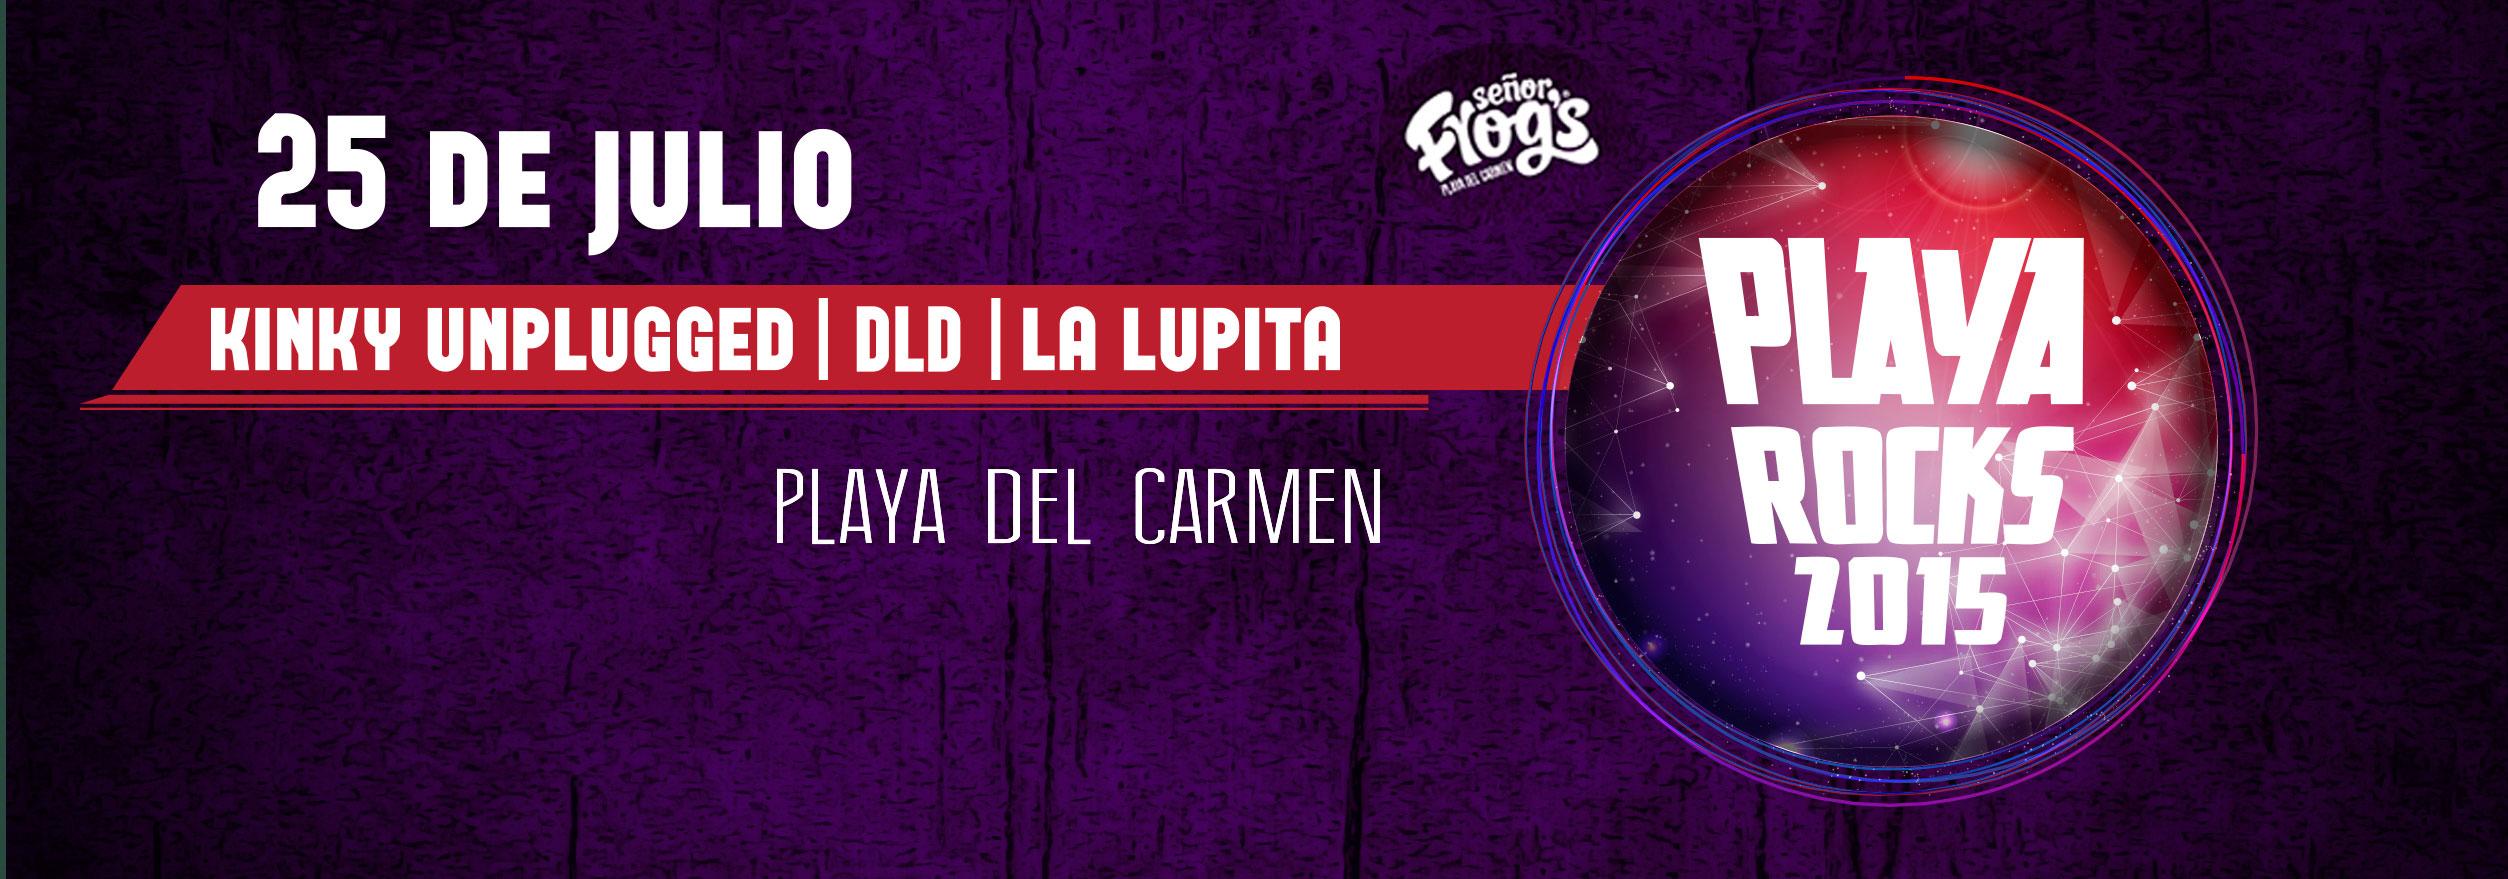 Playa Rocks 2015 Playa del Carmen